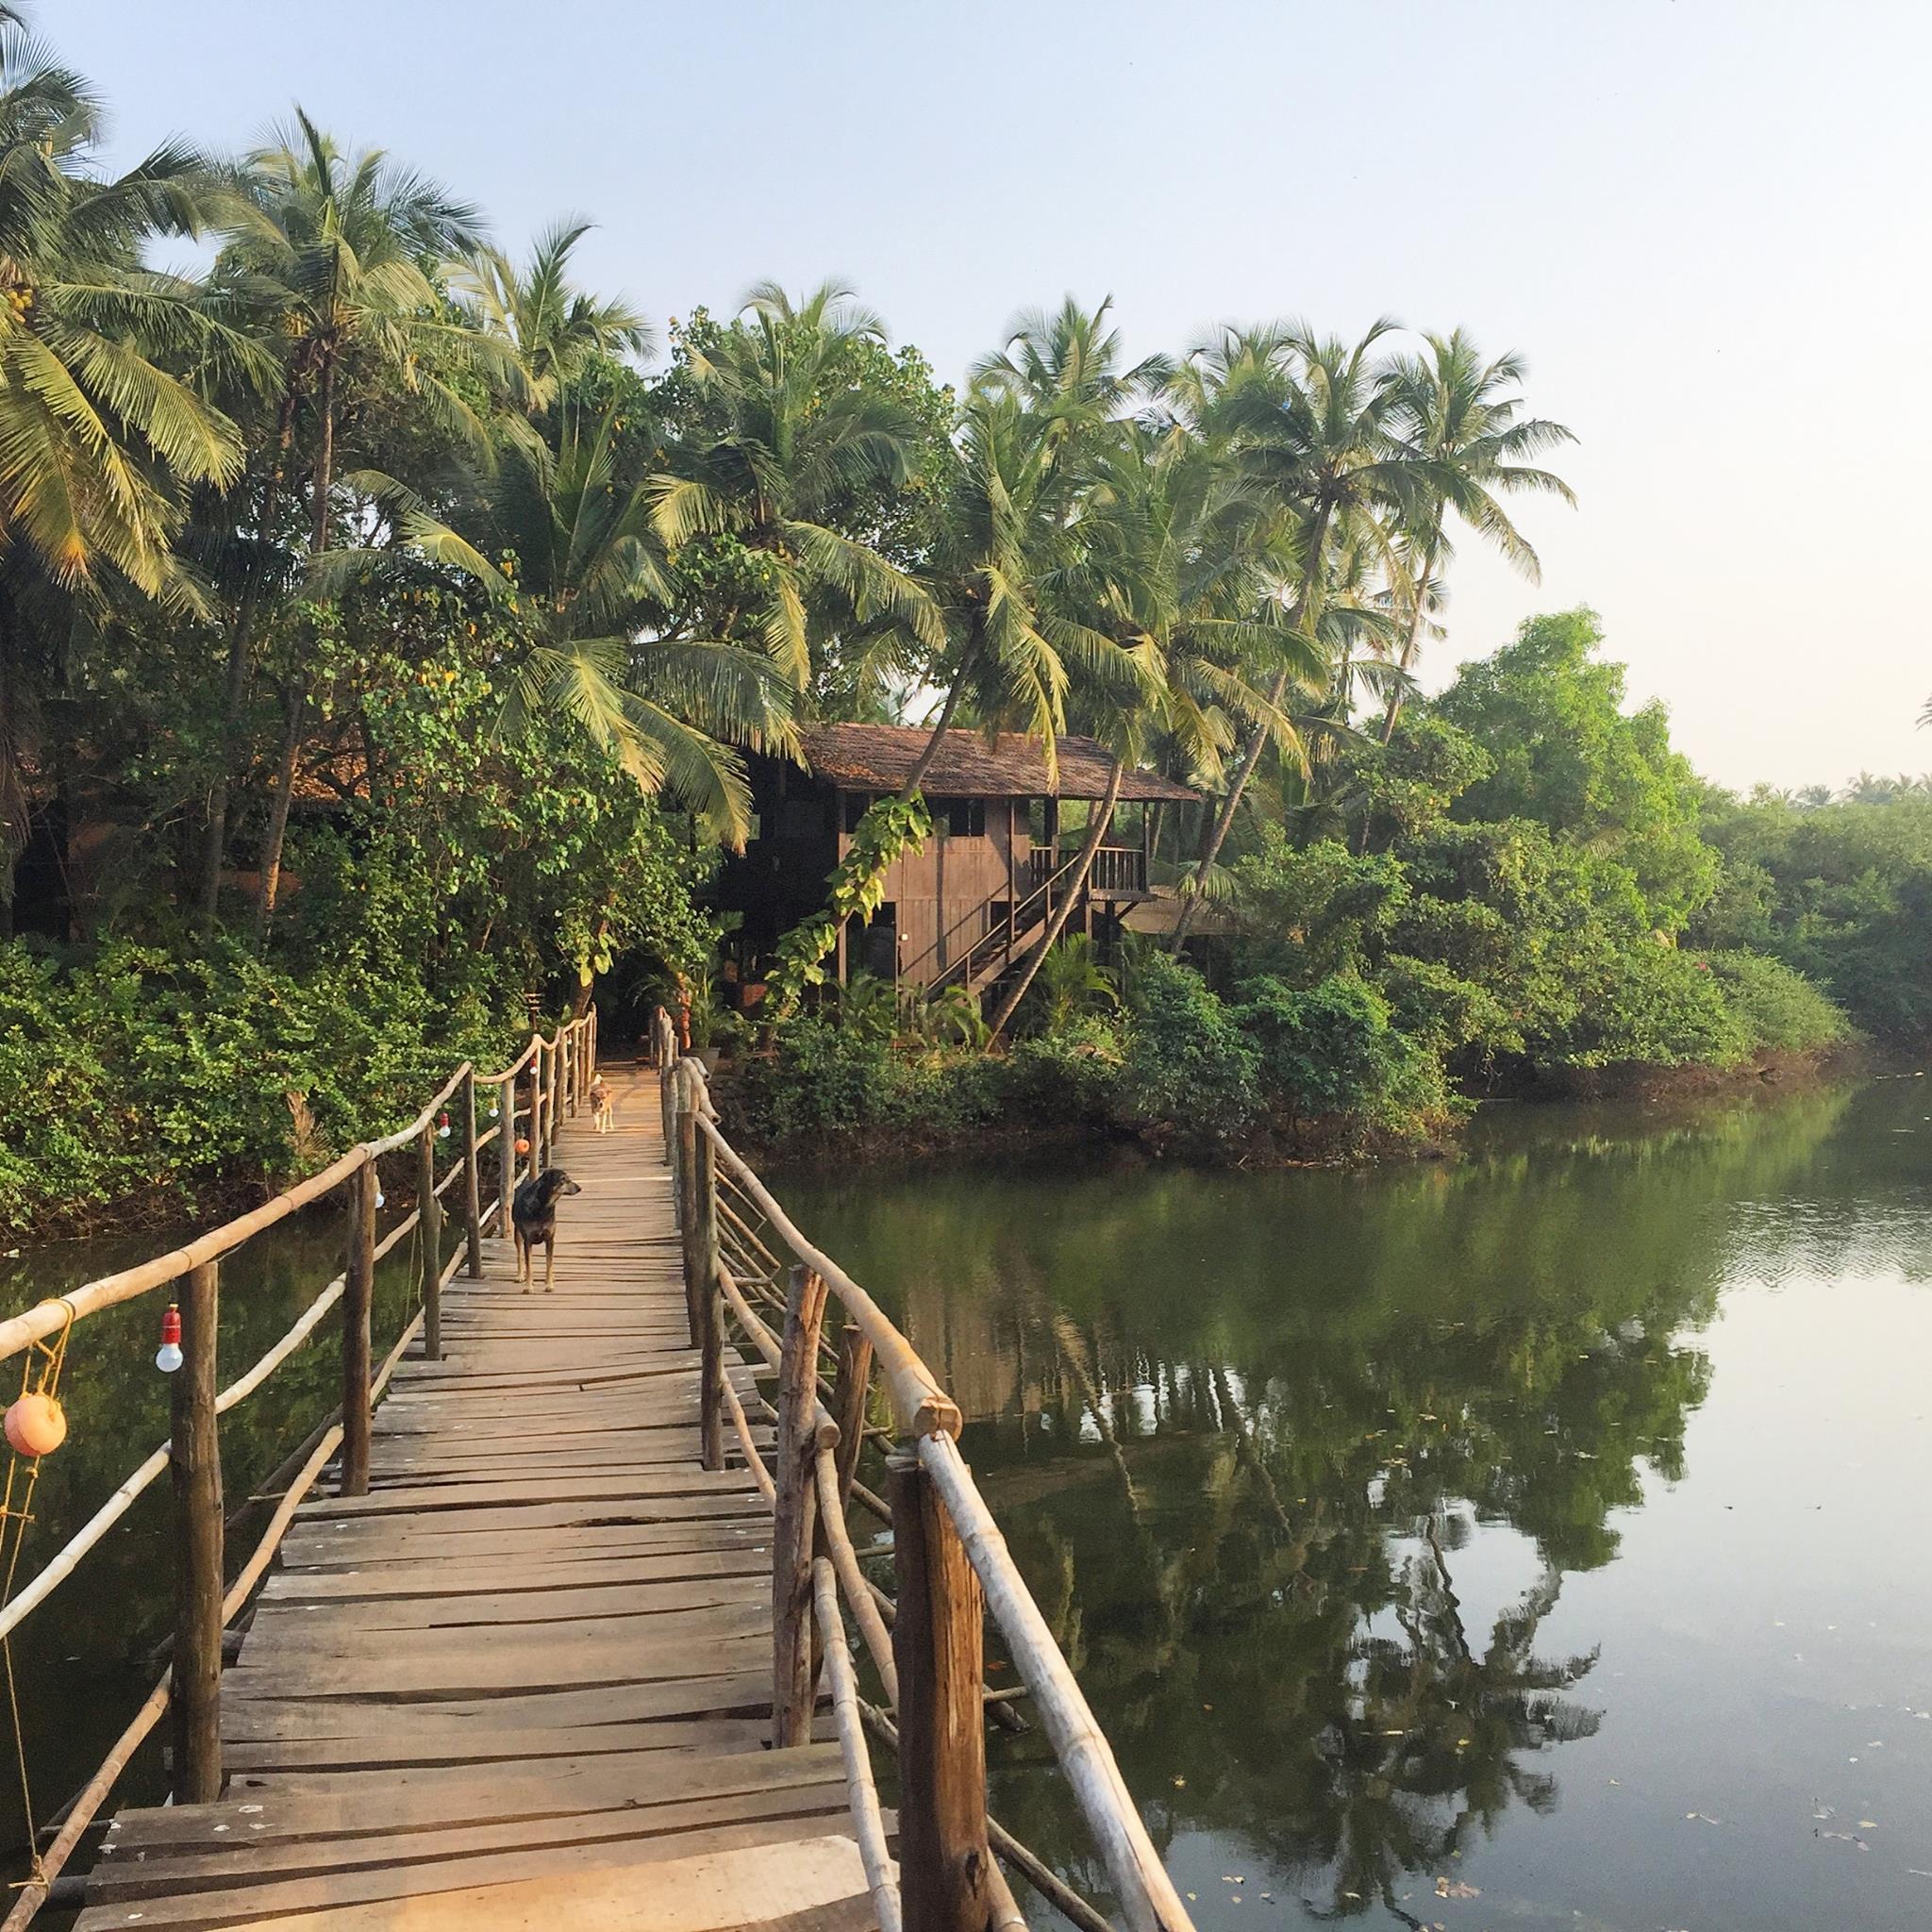 Entrance to the retreat, Goa, India.